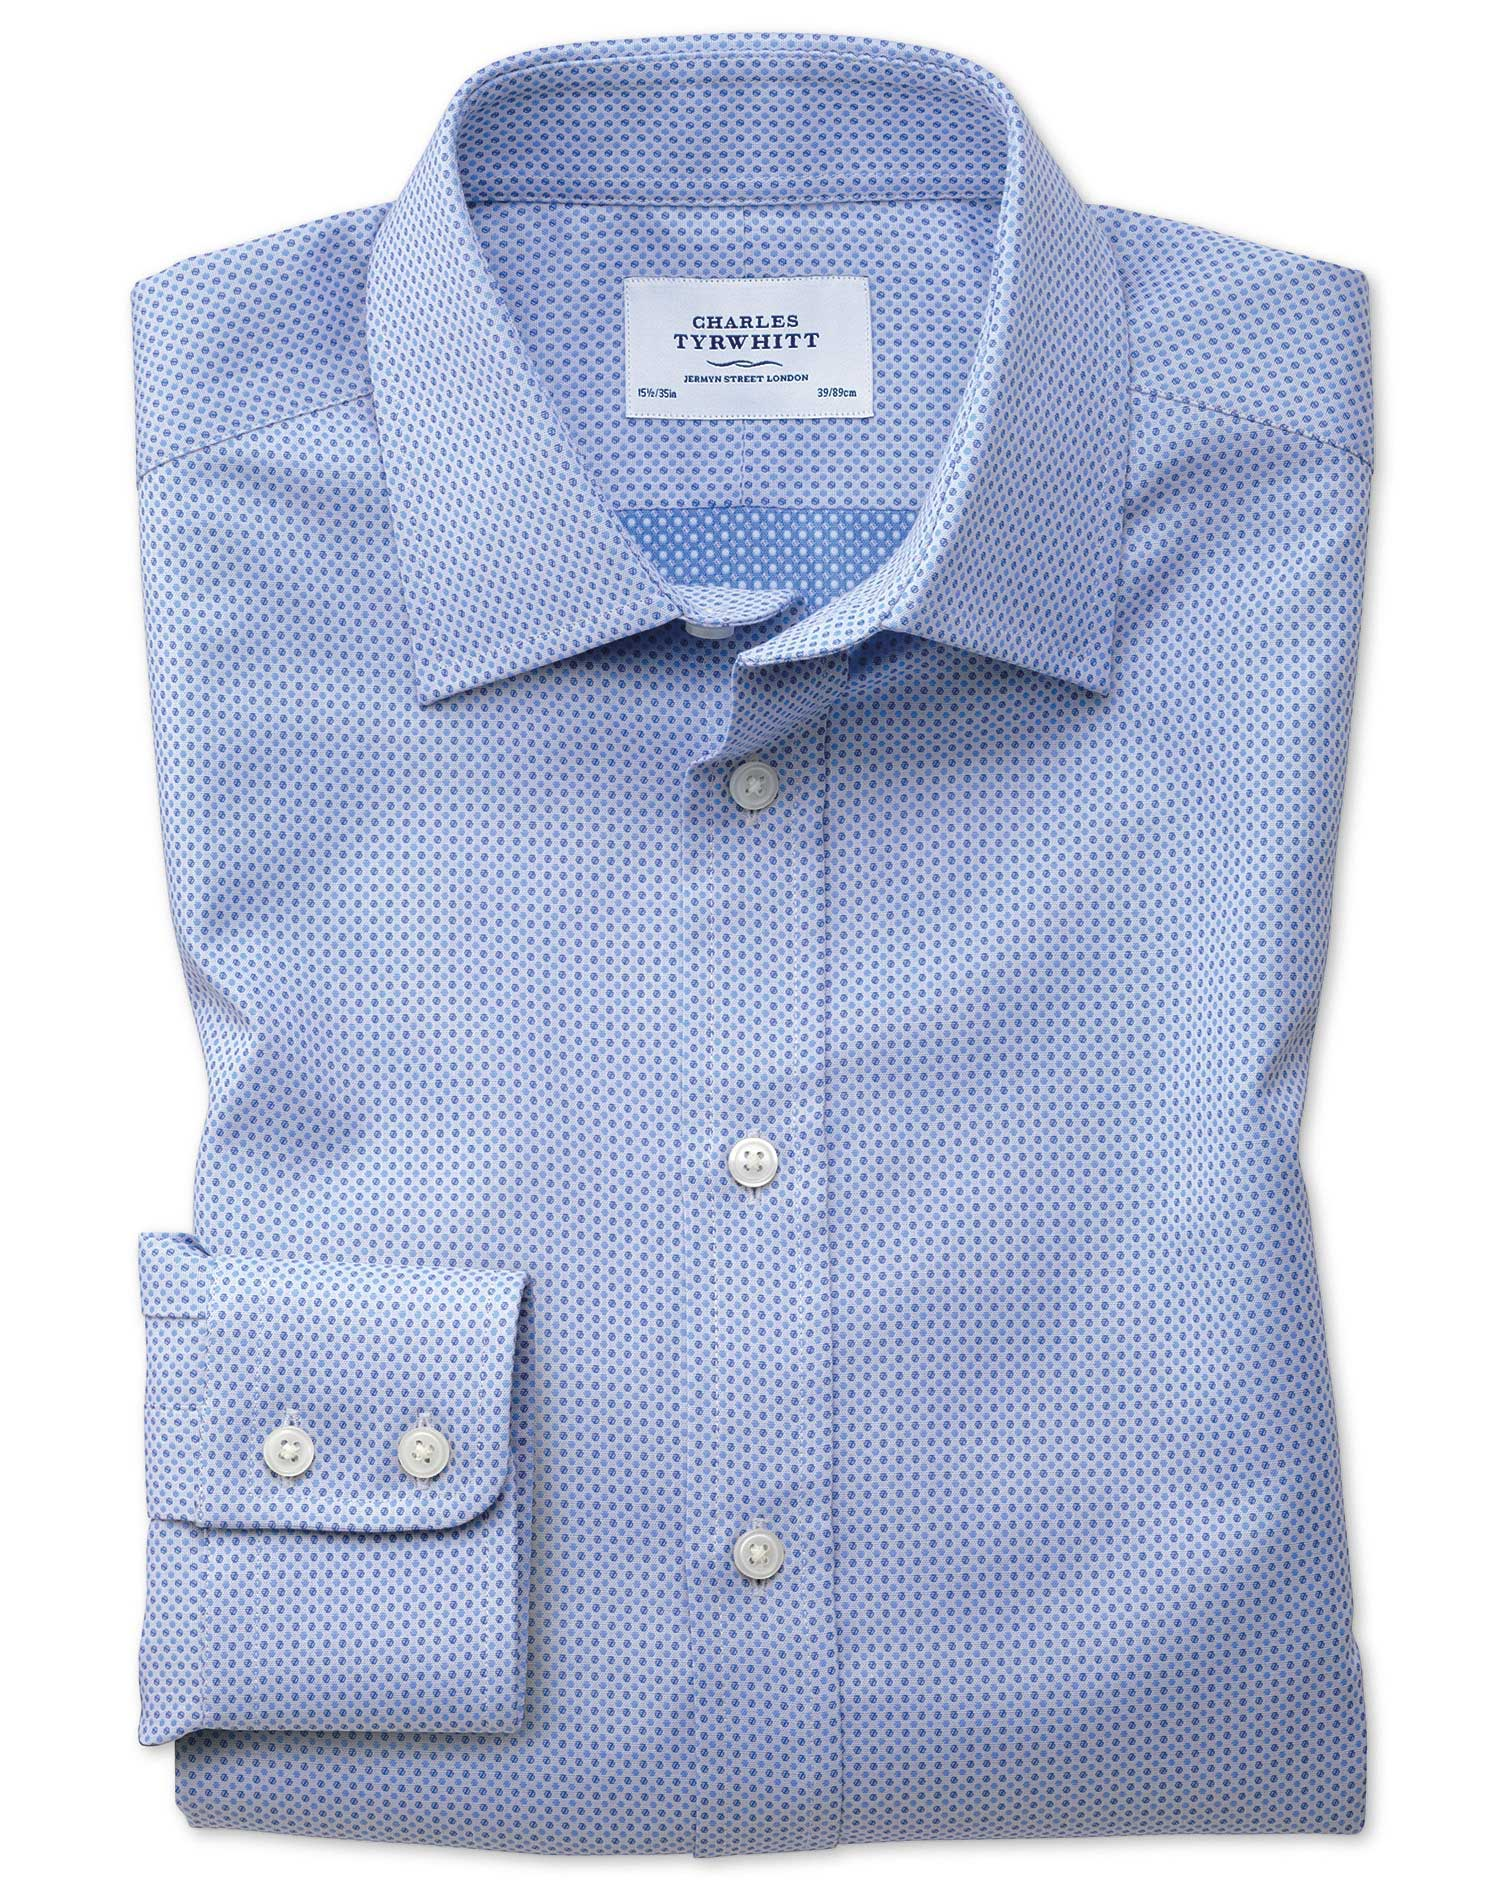 Slim Fit Egyptian Cotton Spot Weave Sky Blue Formal Shirt Single Cuff Size 16/35 by Charles Tyrwhitt